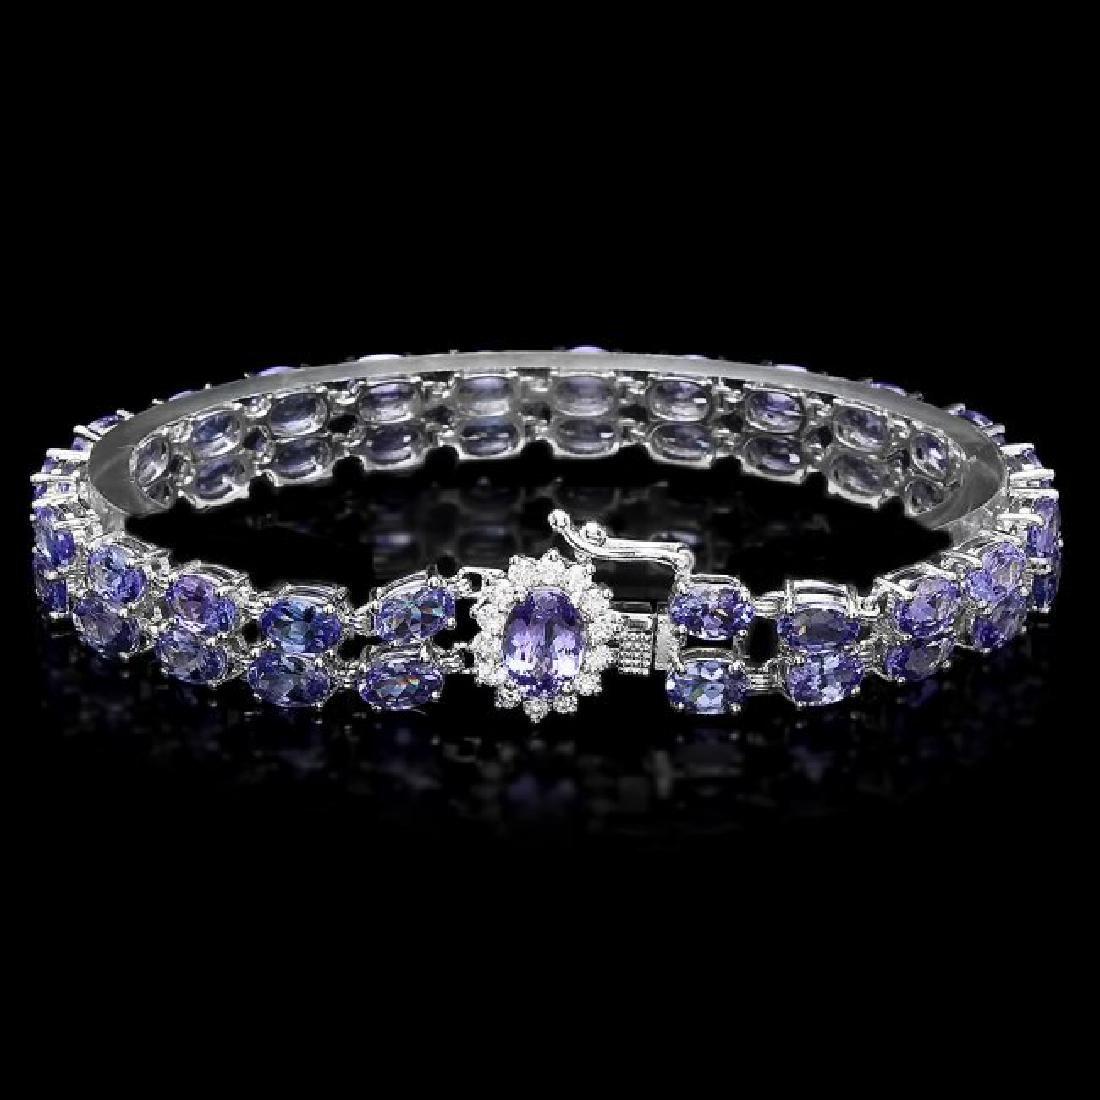 14k 22.35ct Tanzanite 0.45ct Diamond Bracelet - 2